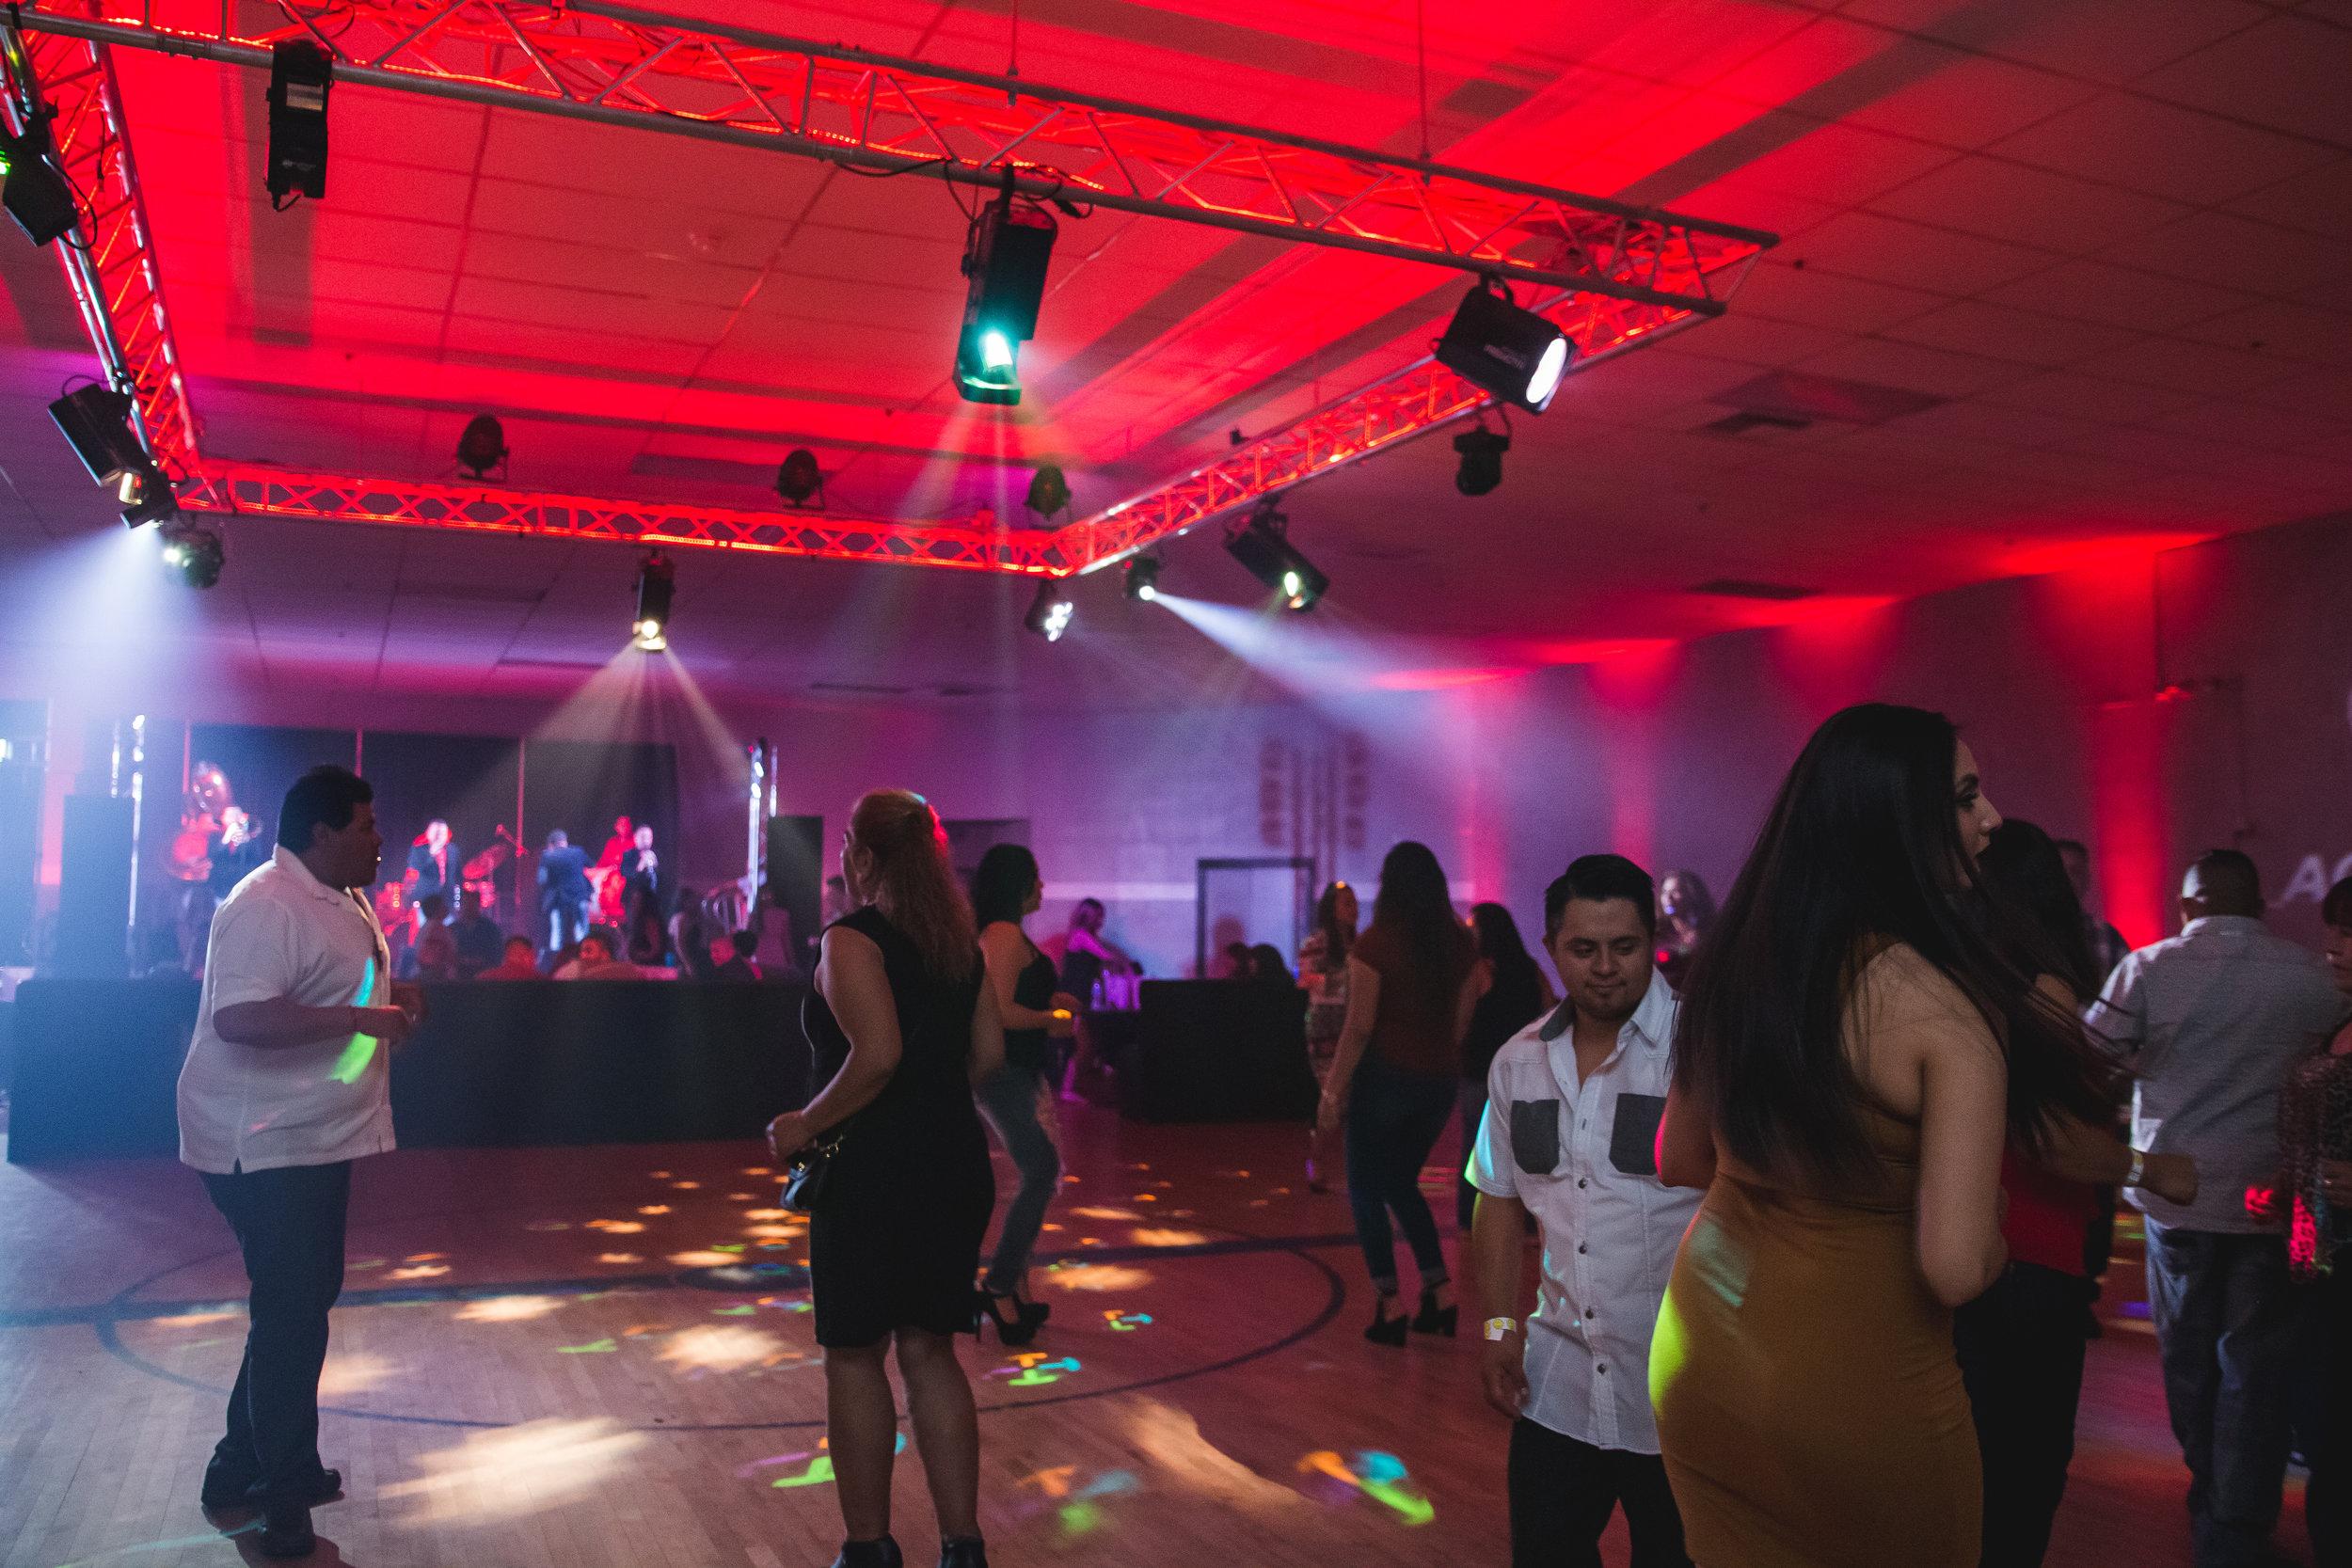 10-3-16 Aguila Real Night Club - IMG_8055.jpg